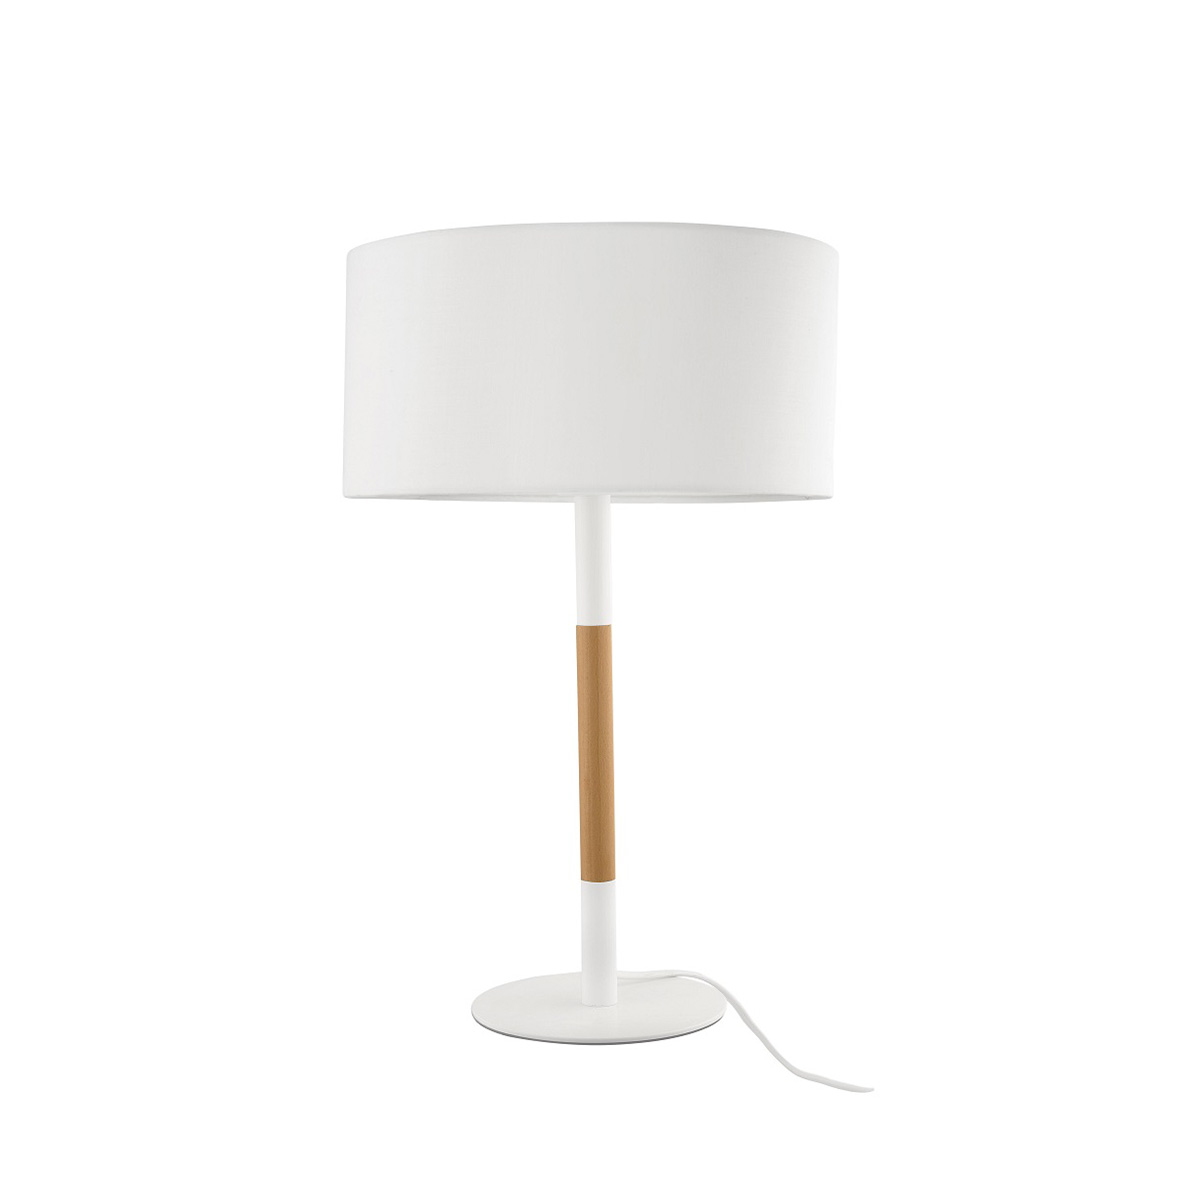 Stona lampa ARRIGO 7605183